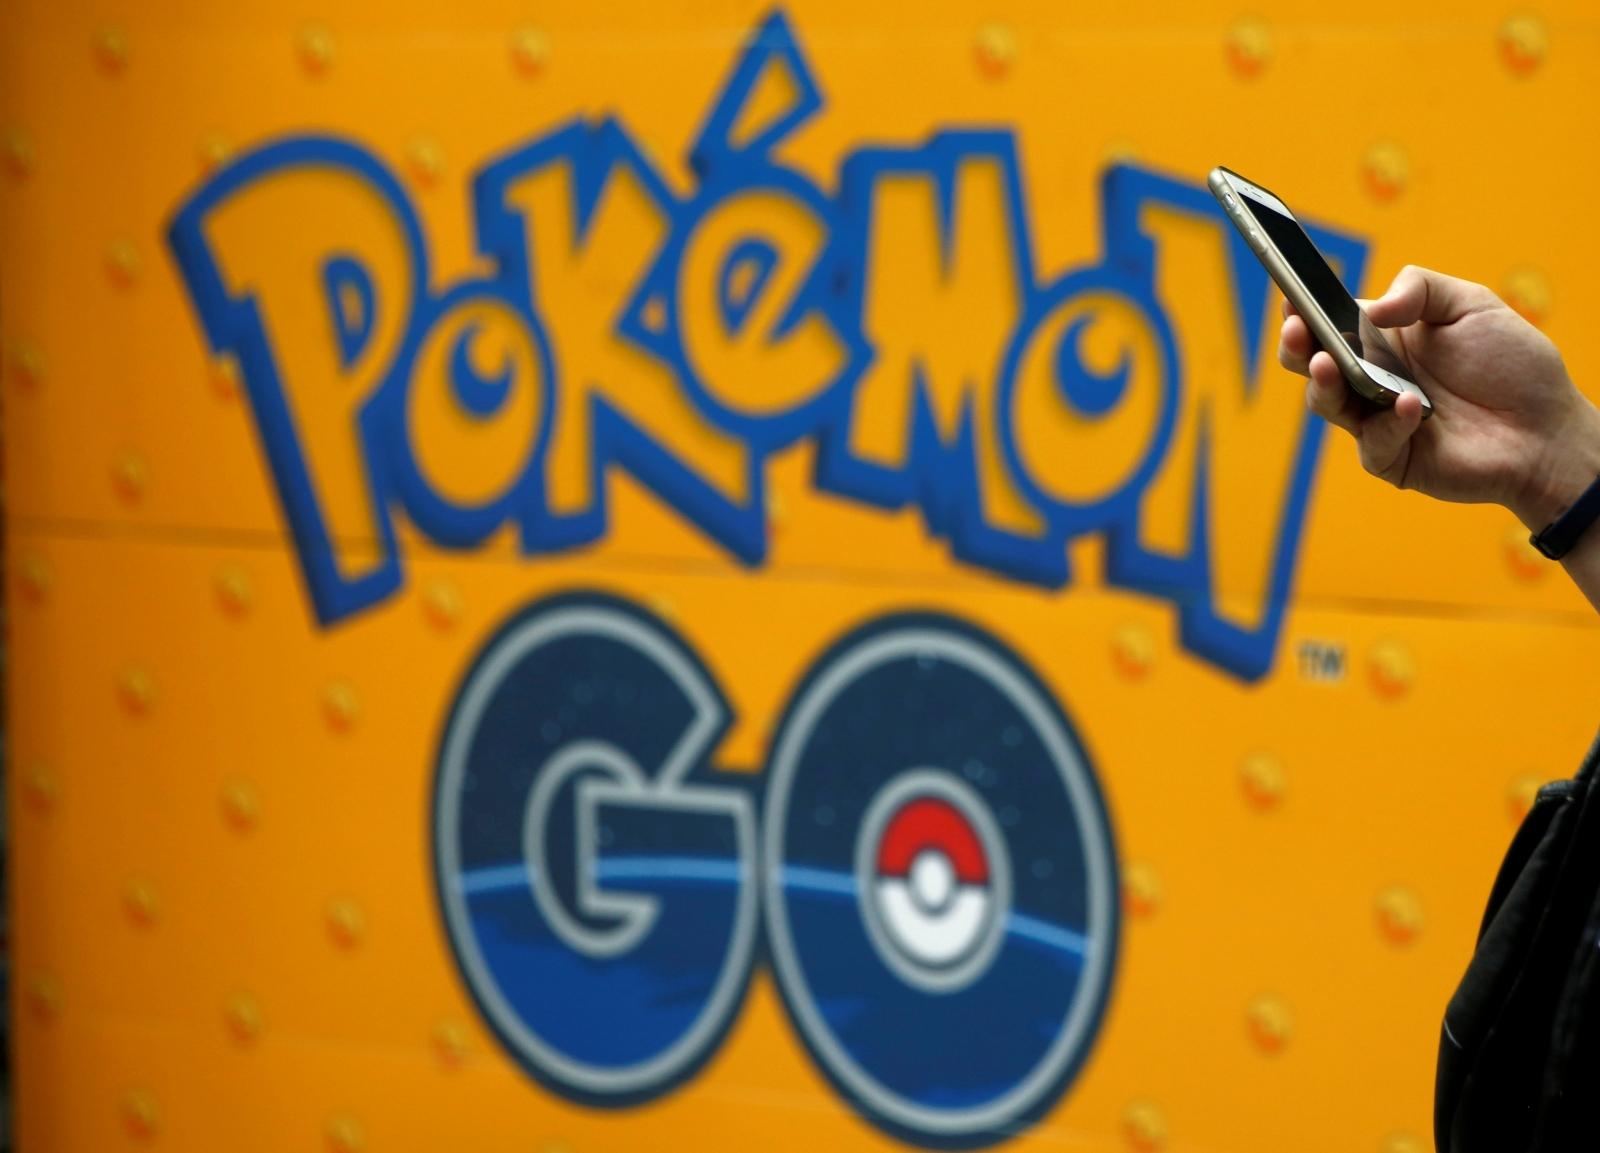 Pokemon Go Indonesia ban